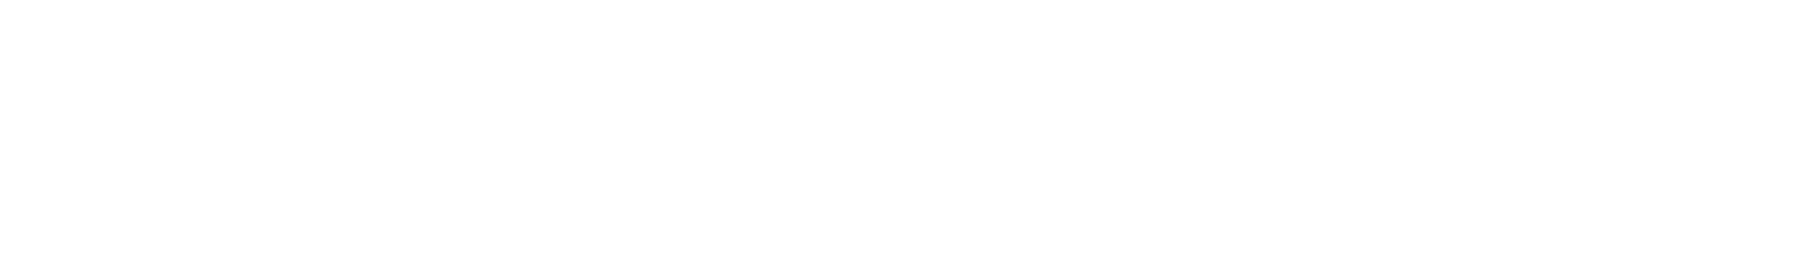 organ a6